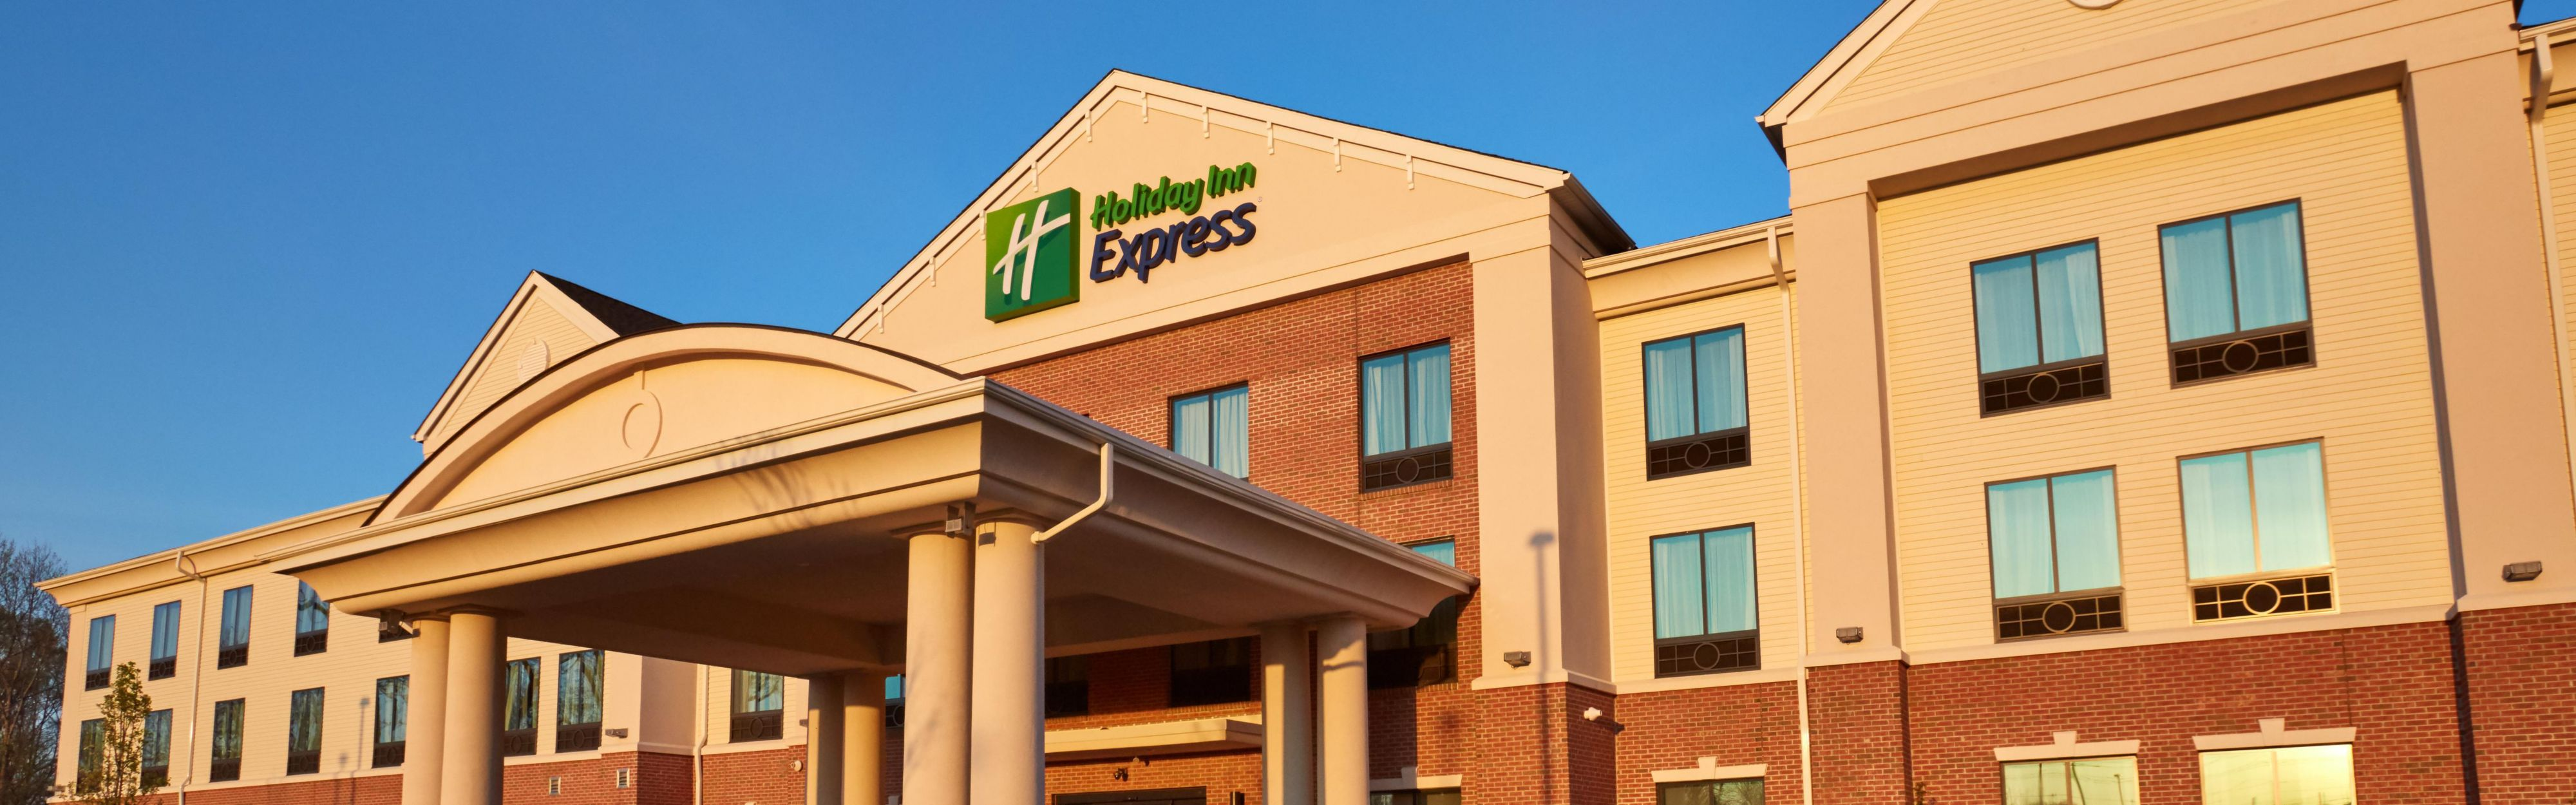 Holiday Inn Express Bordentown - Trenton South image 0